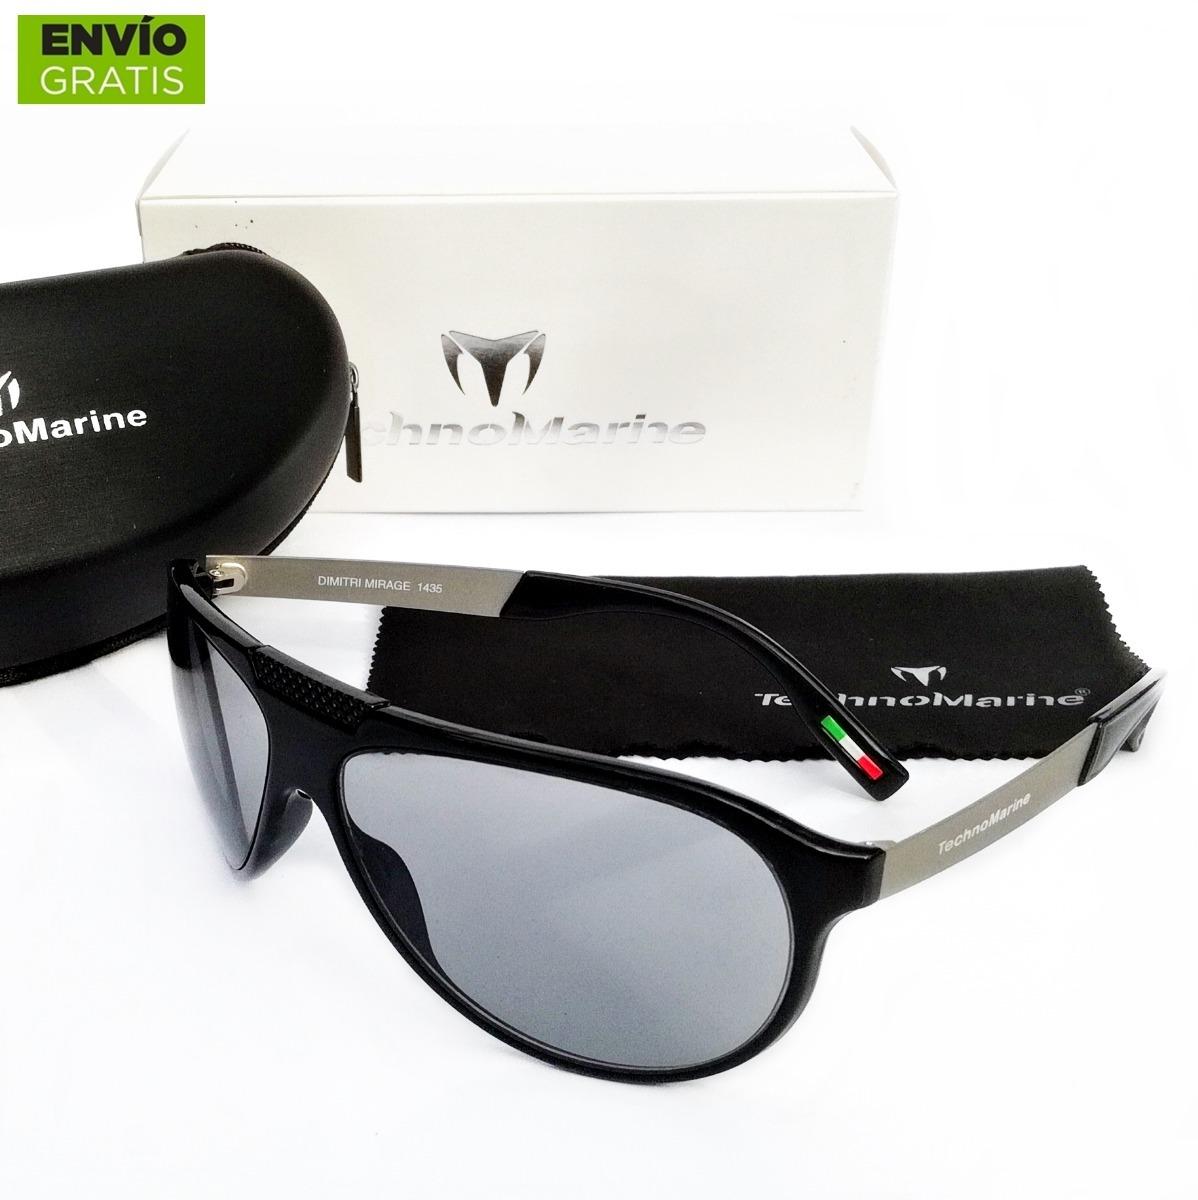 85c3f5eef2 remate gafas technomarine economicas importadas envio n03. Cargando zoom.